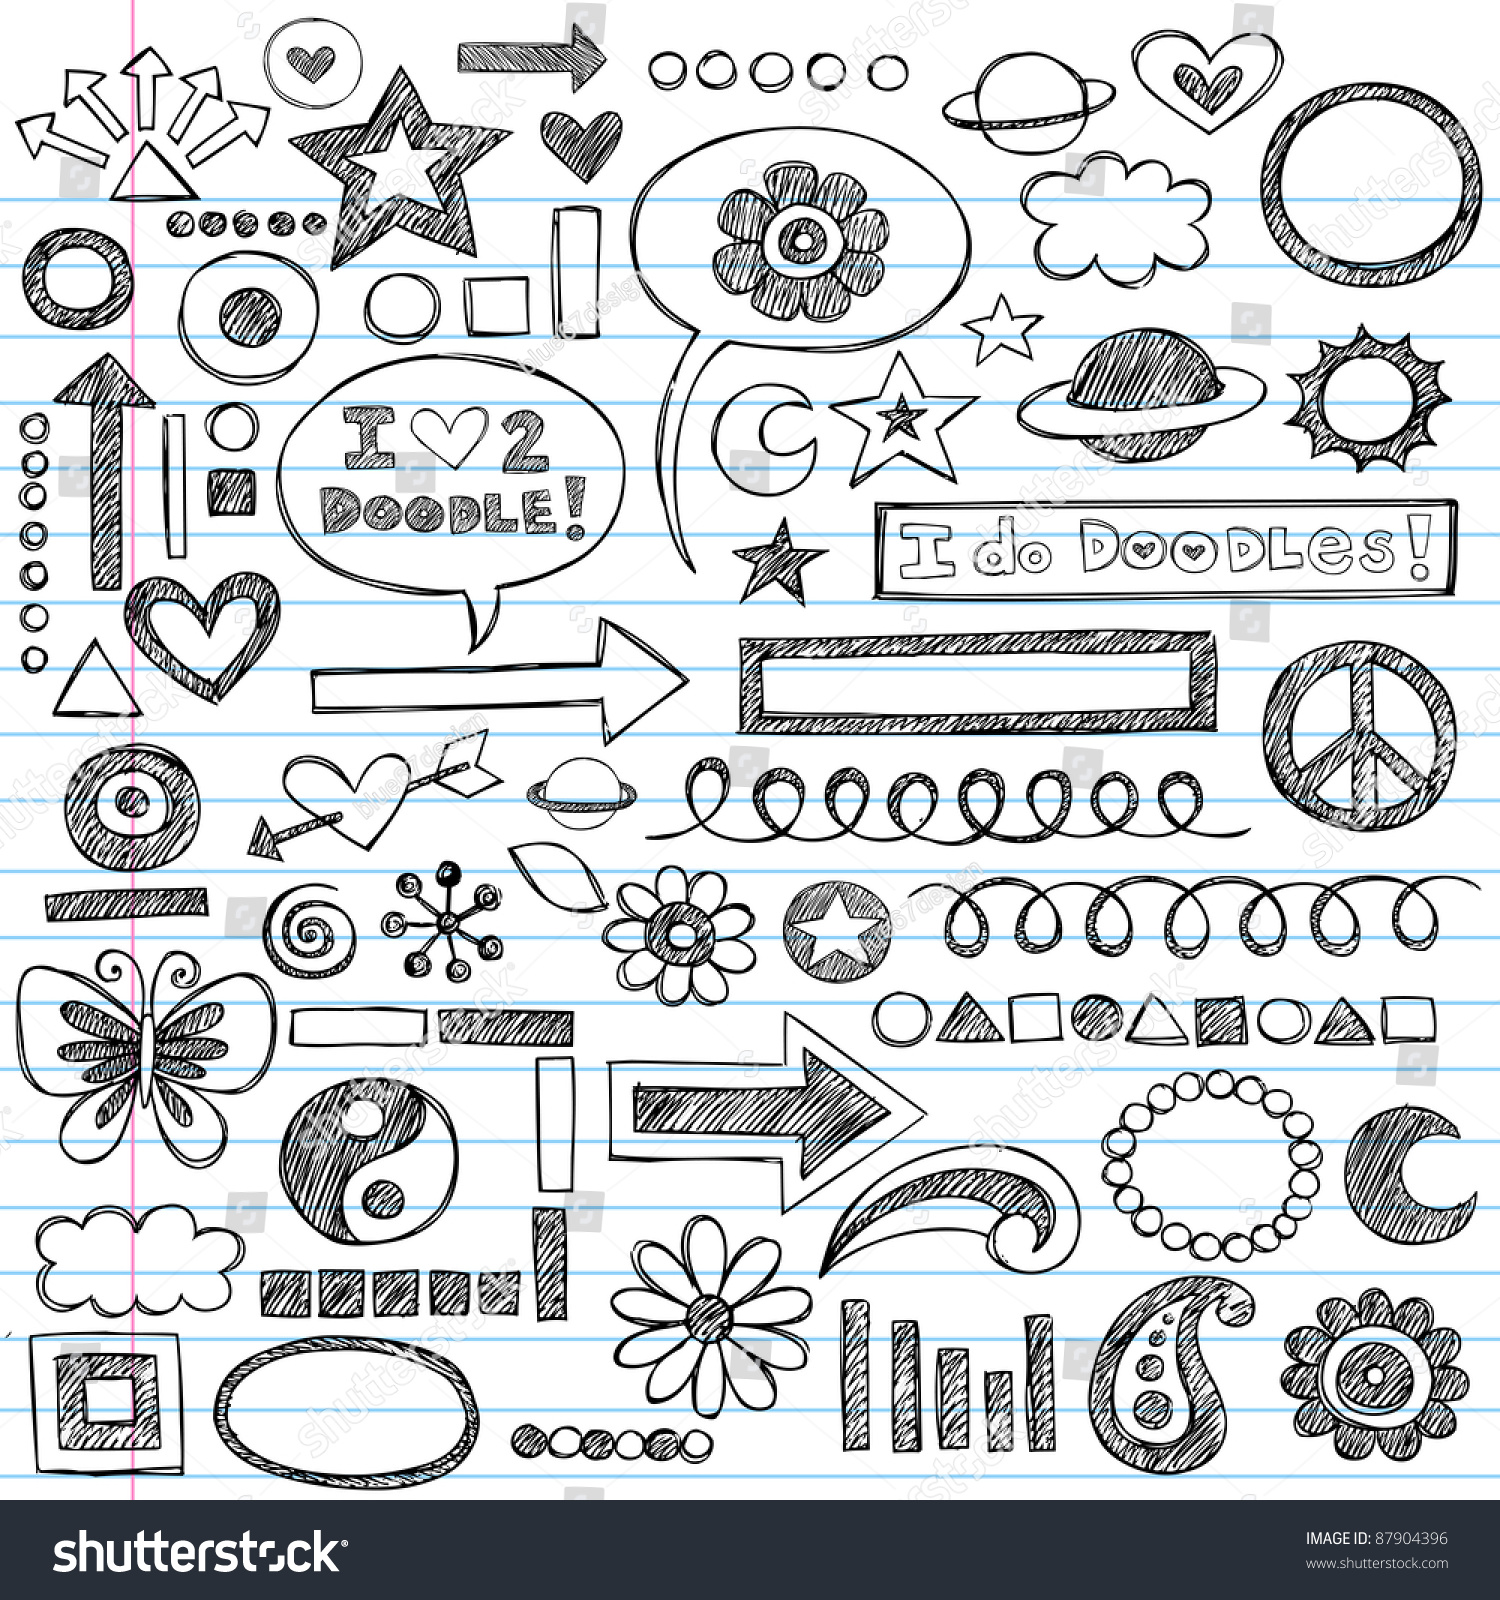 Sketchy notebook doodles set handdrawn design stock vector for Tumblr hand doodles